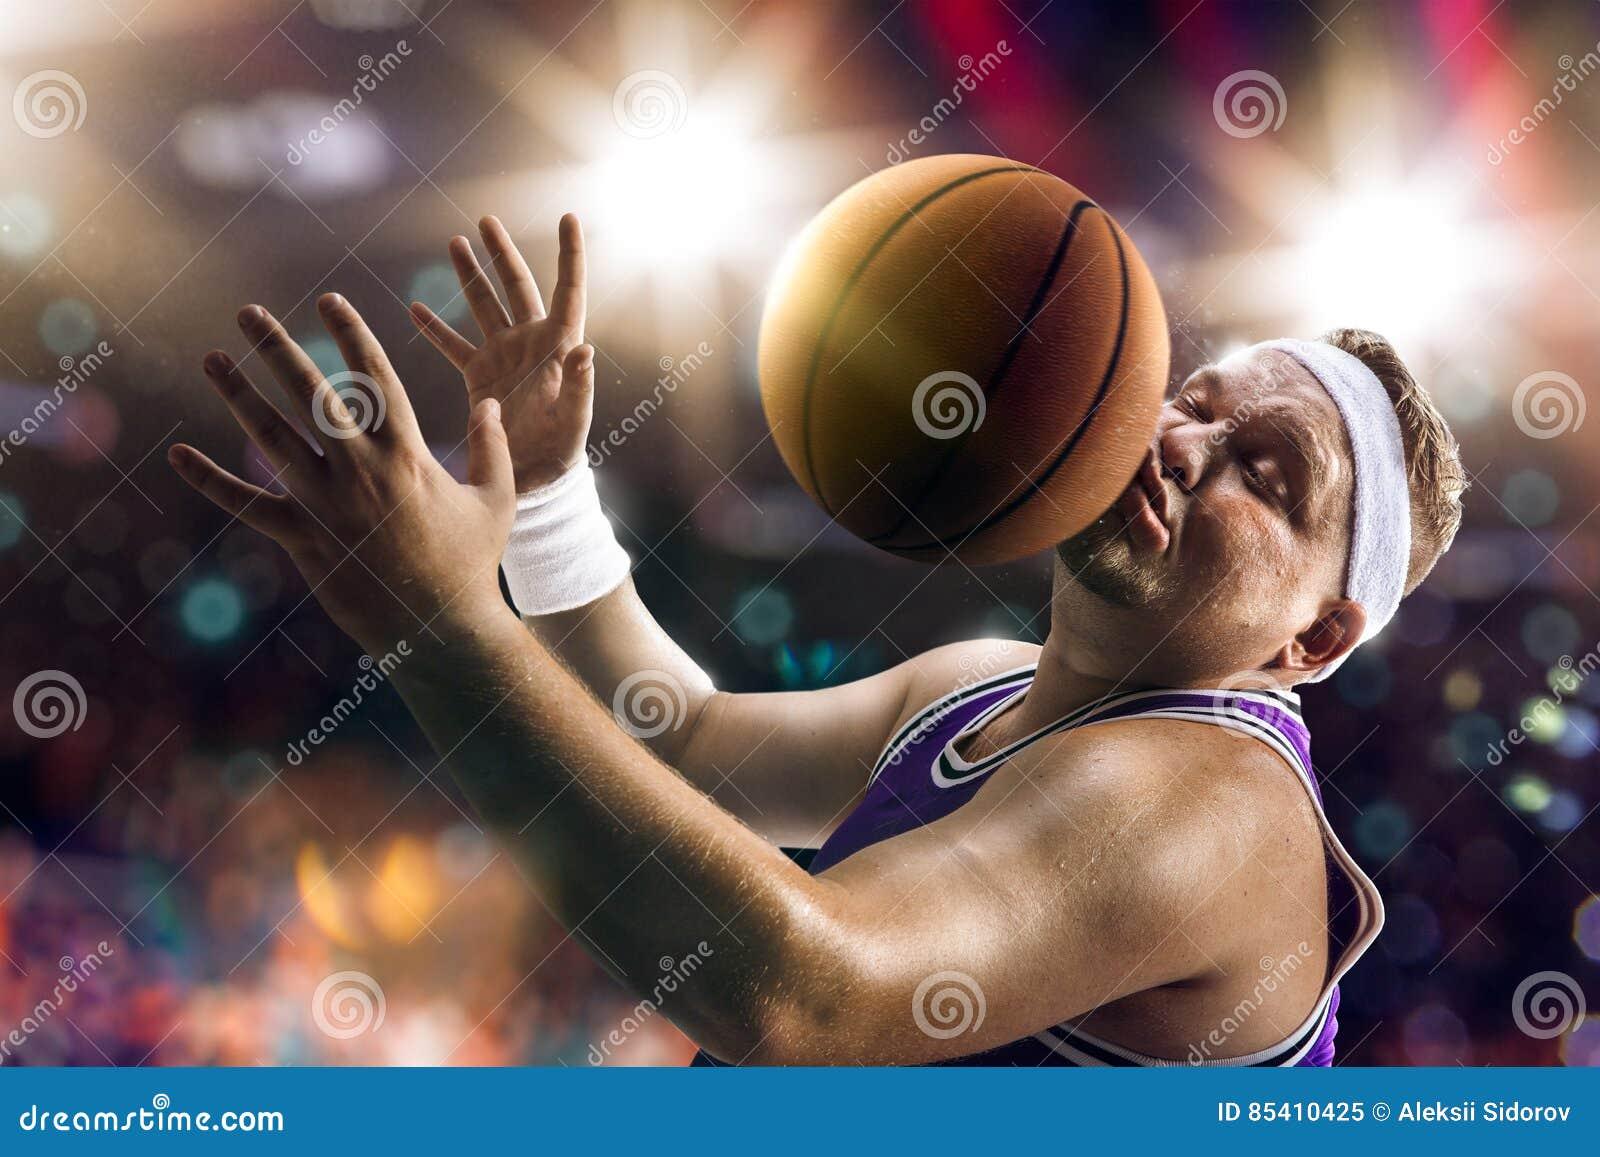 Fat Basketball non professional player catch the balln